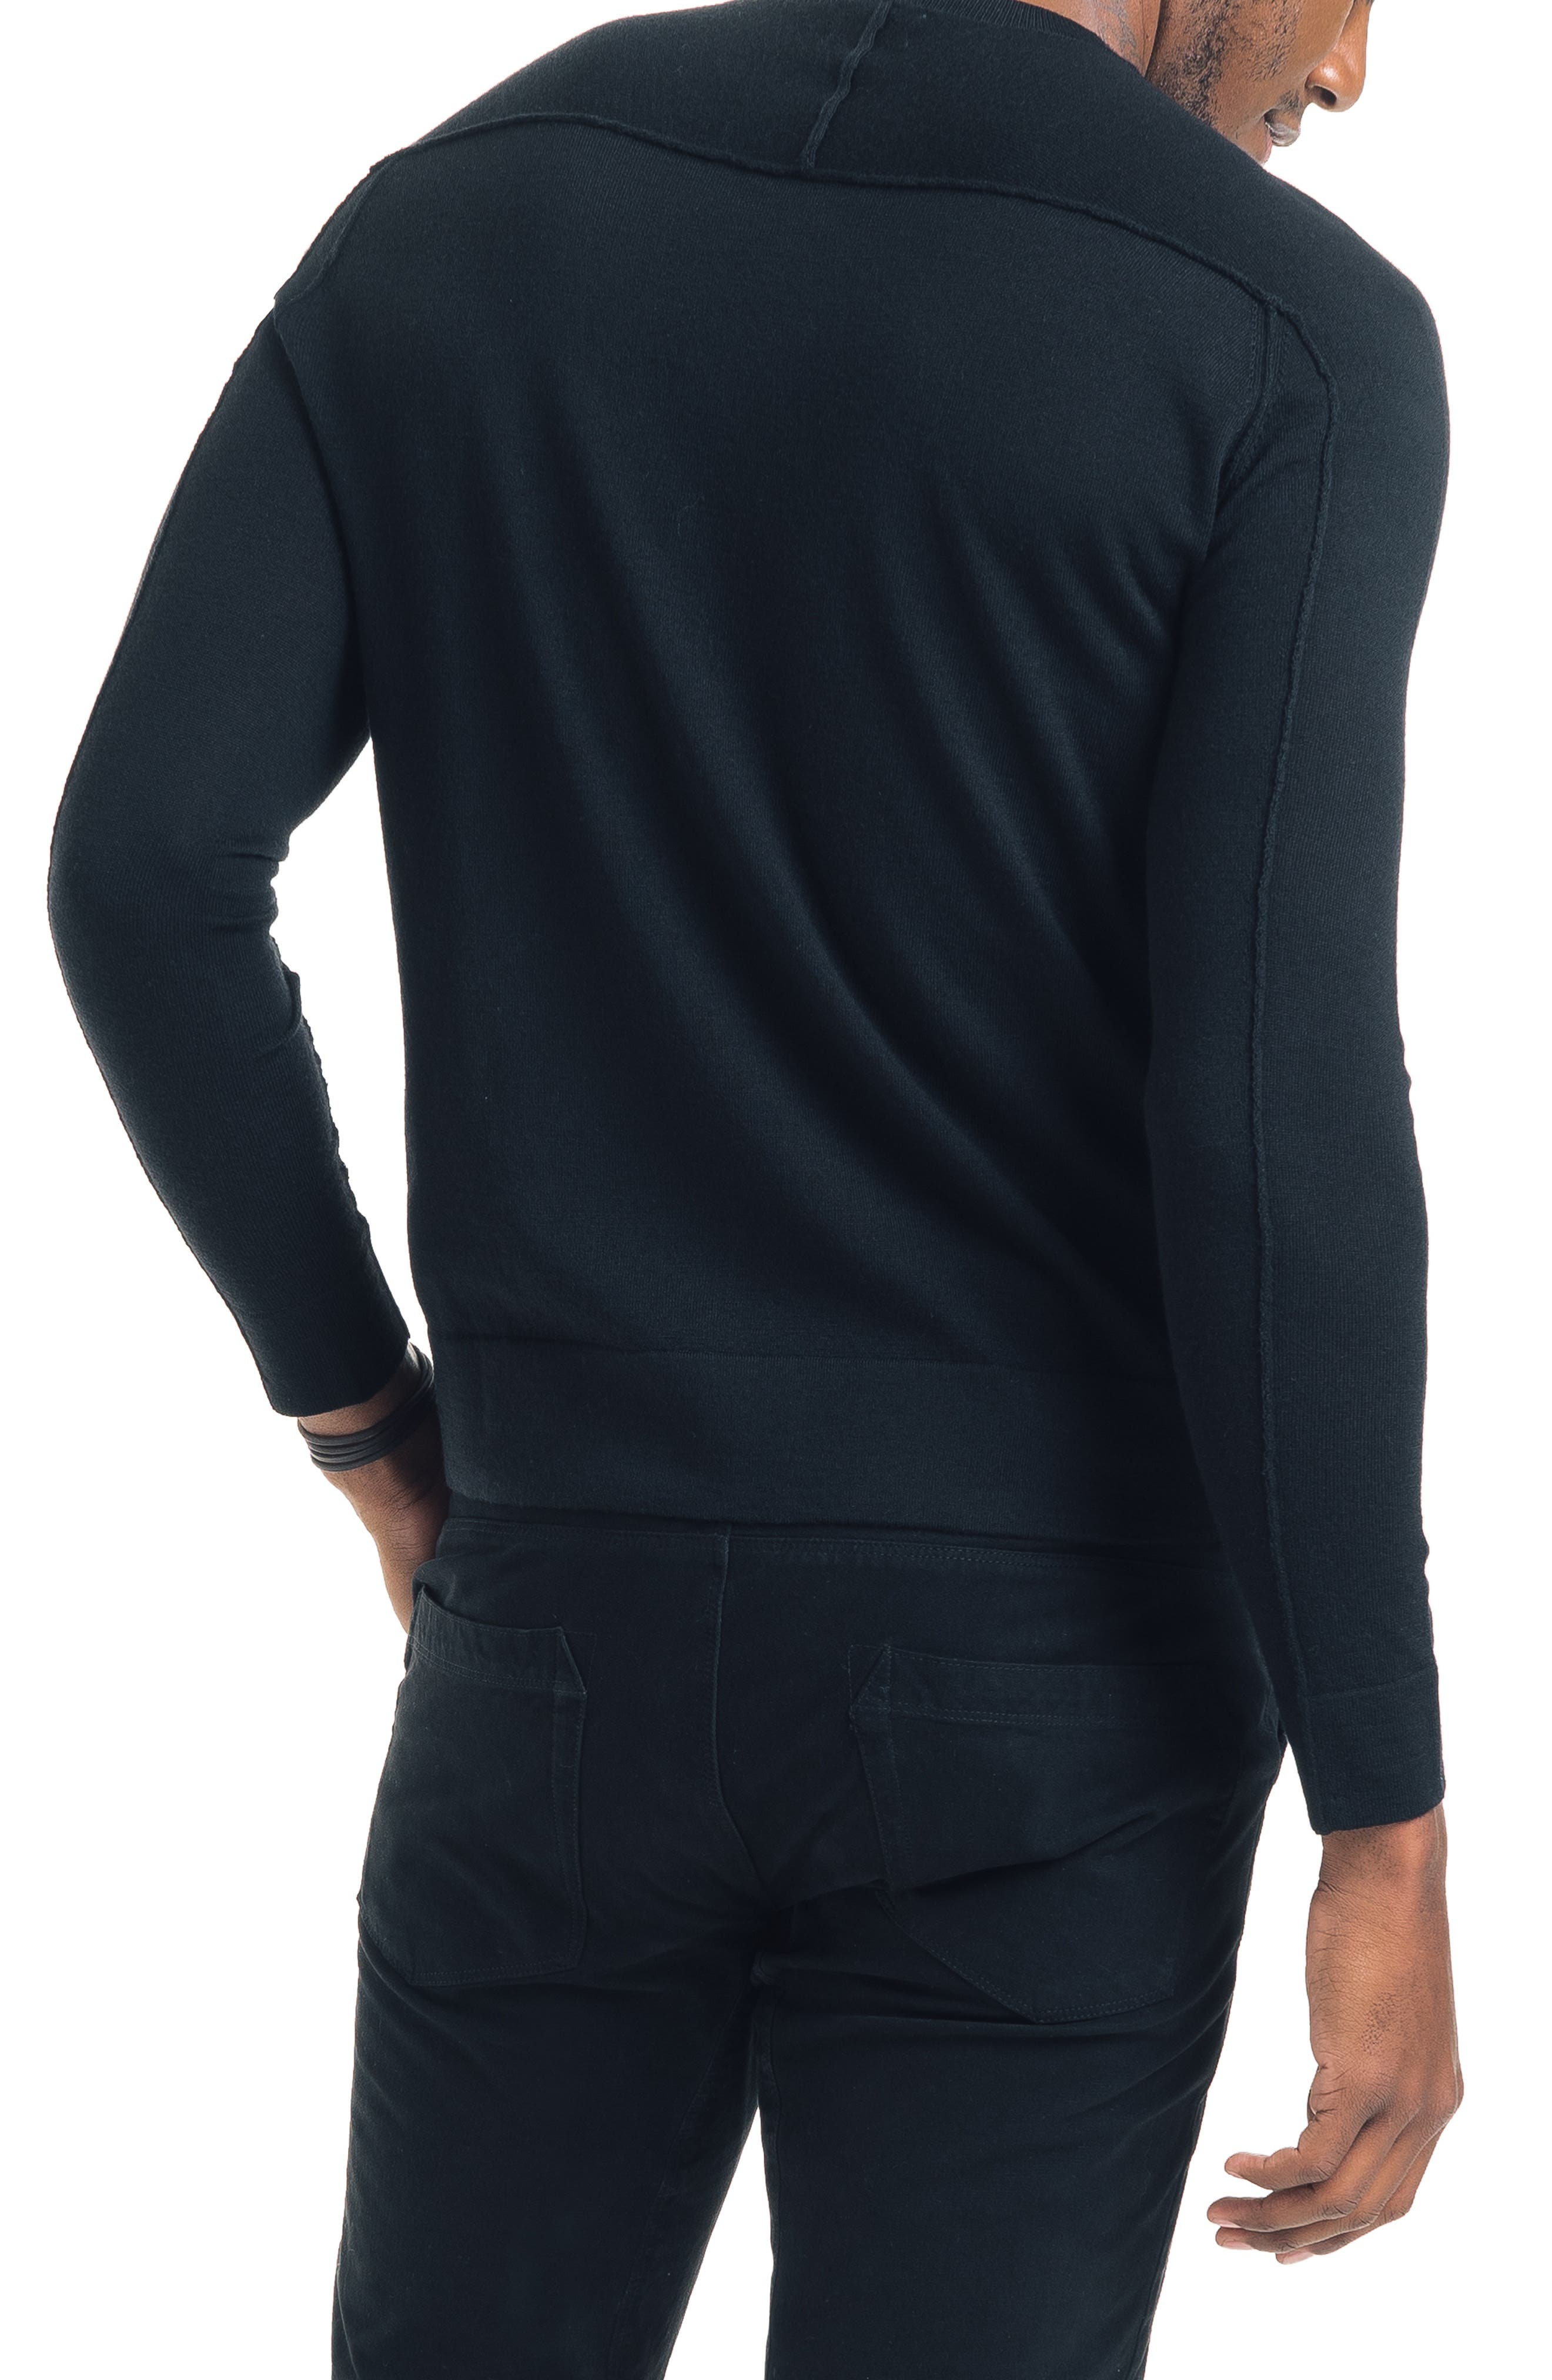 Modern Slim Fit Merino Wool Sweater,                             Alternate thumbnail 2, color,                             BLACK